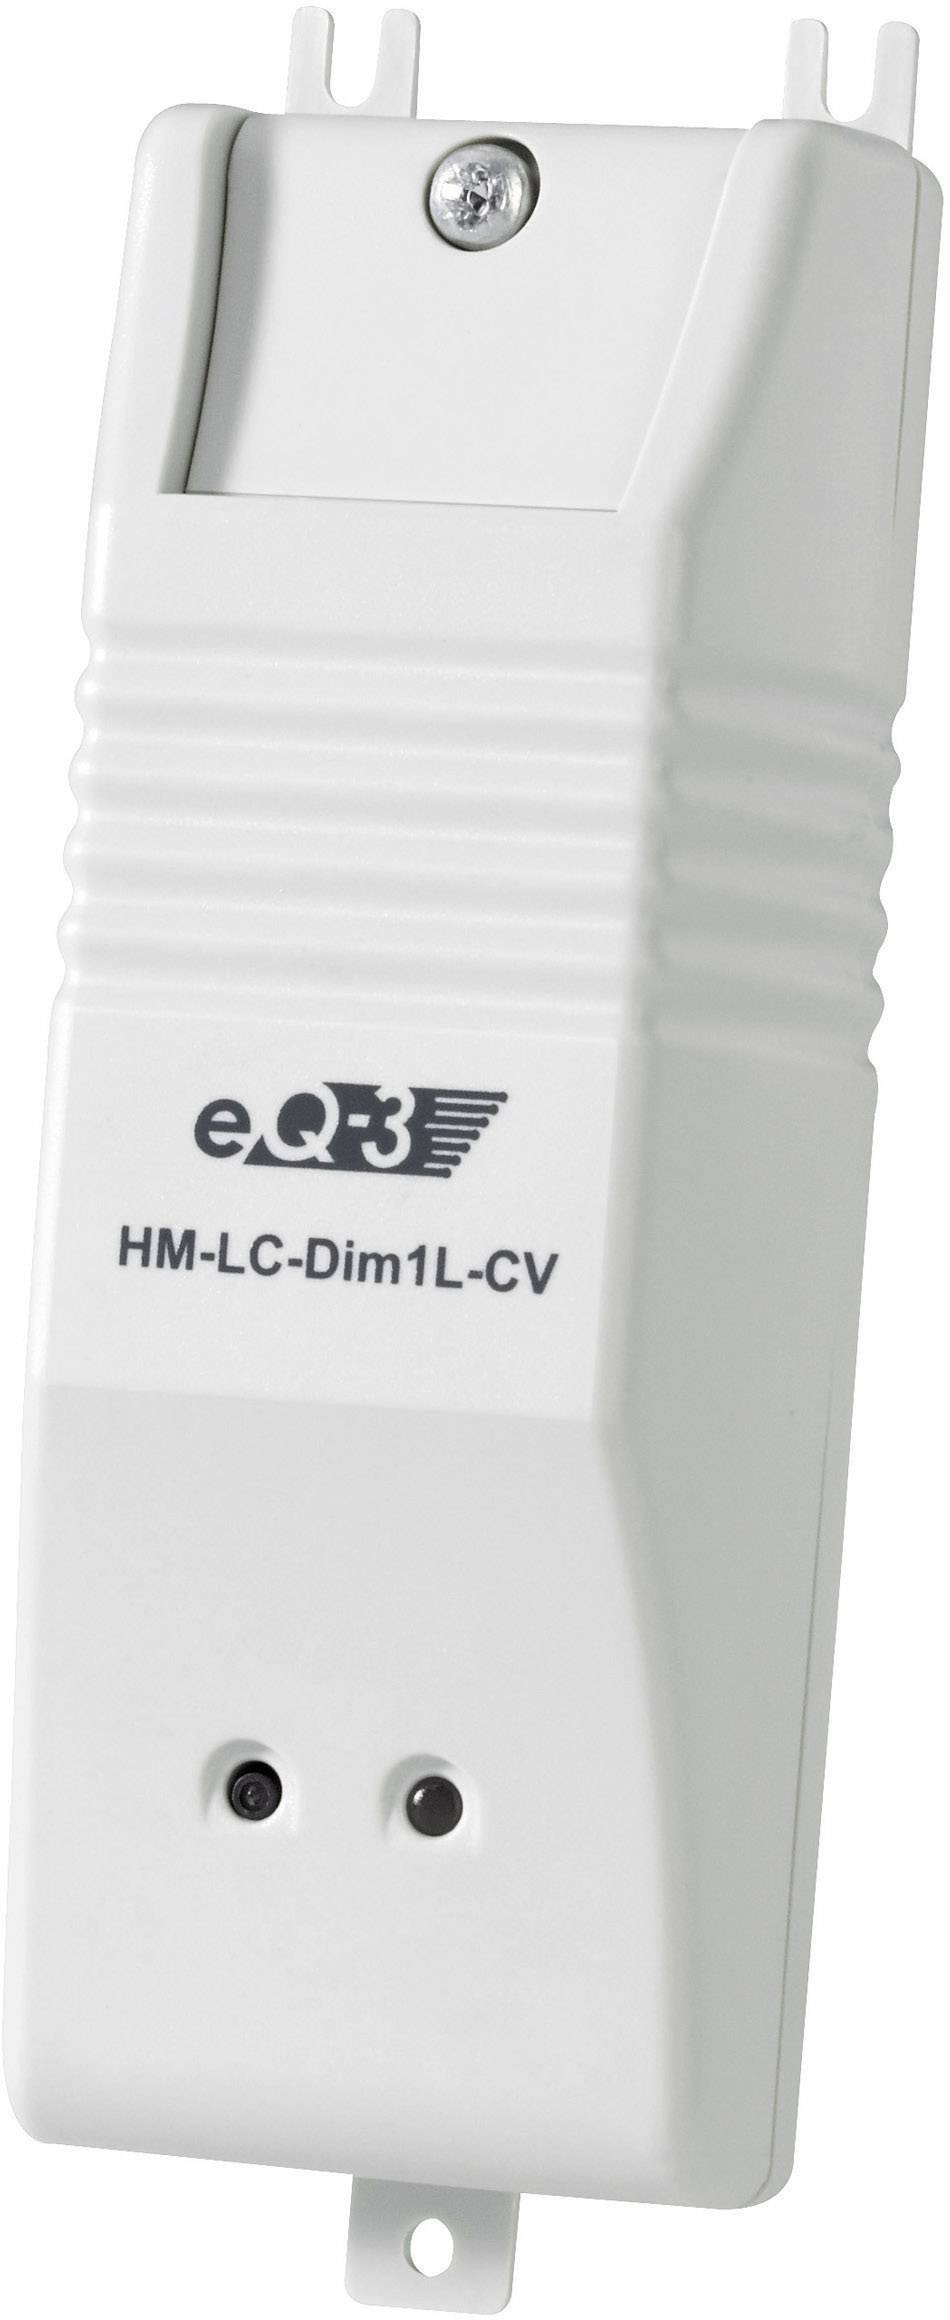 Bezdrátový fázový stmívač do podhledu HomeMatic, 76798, 1kanálový, 200 VA